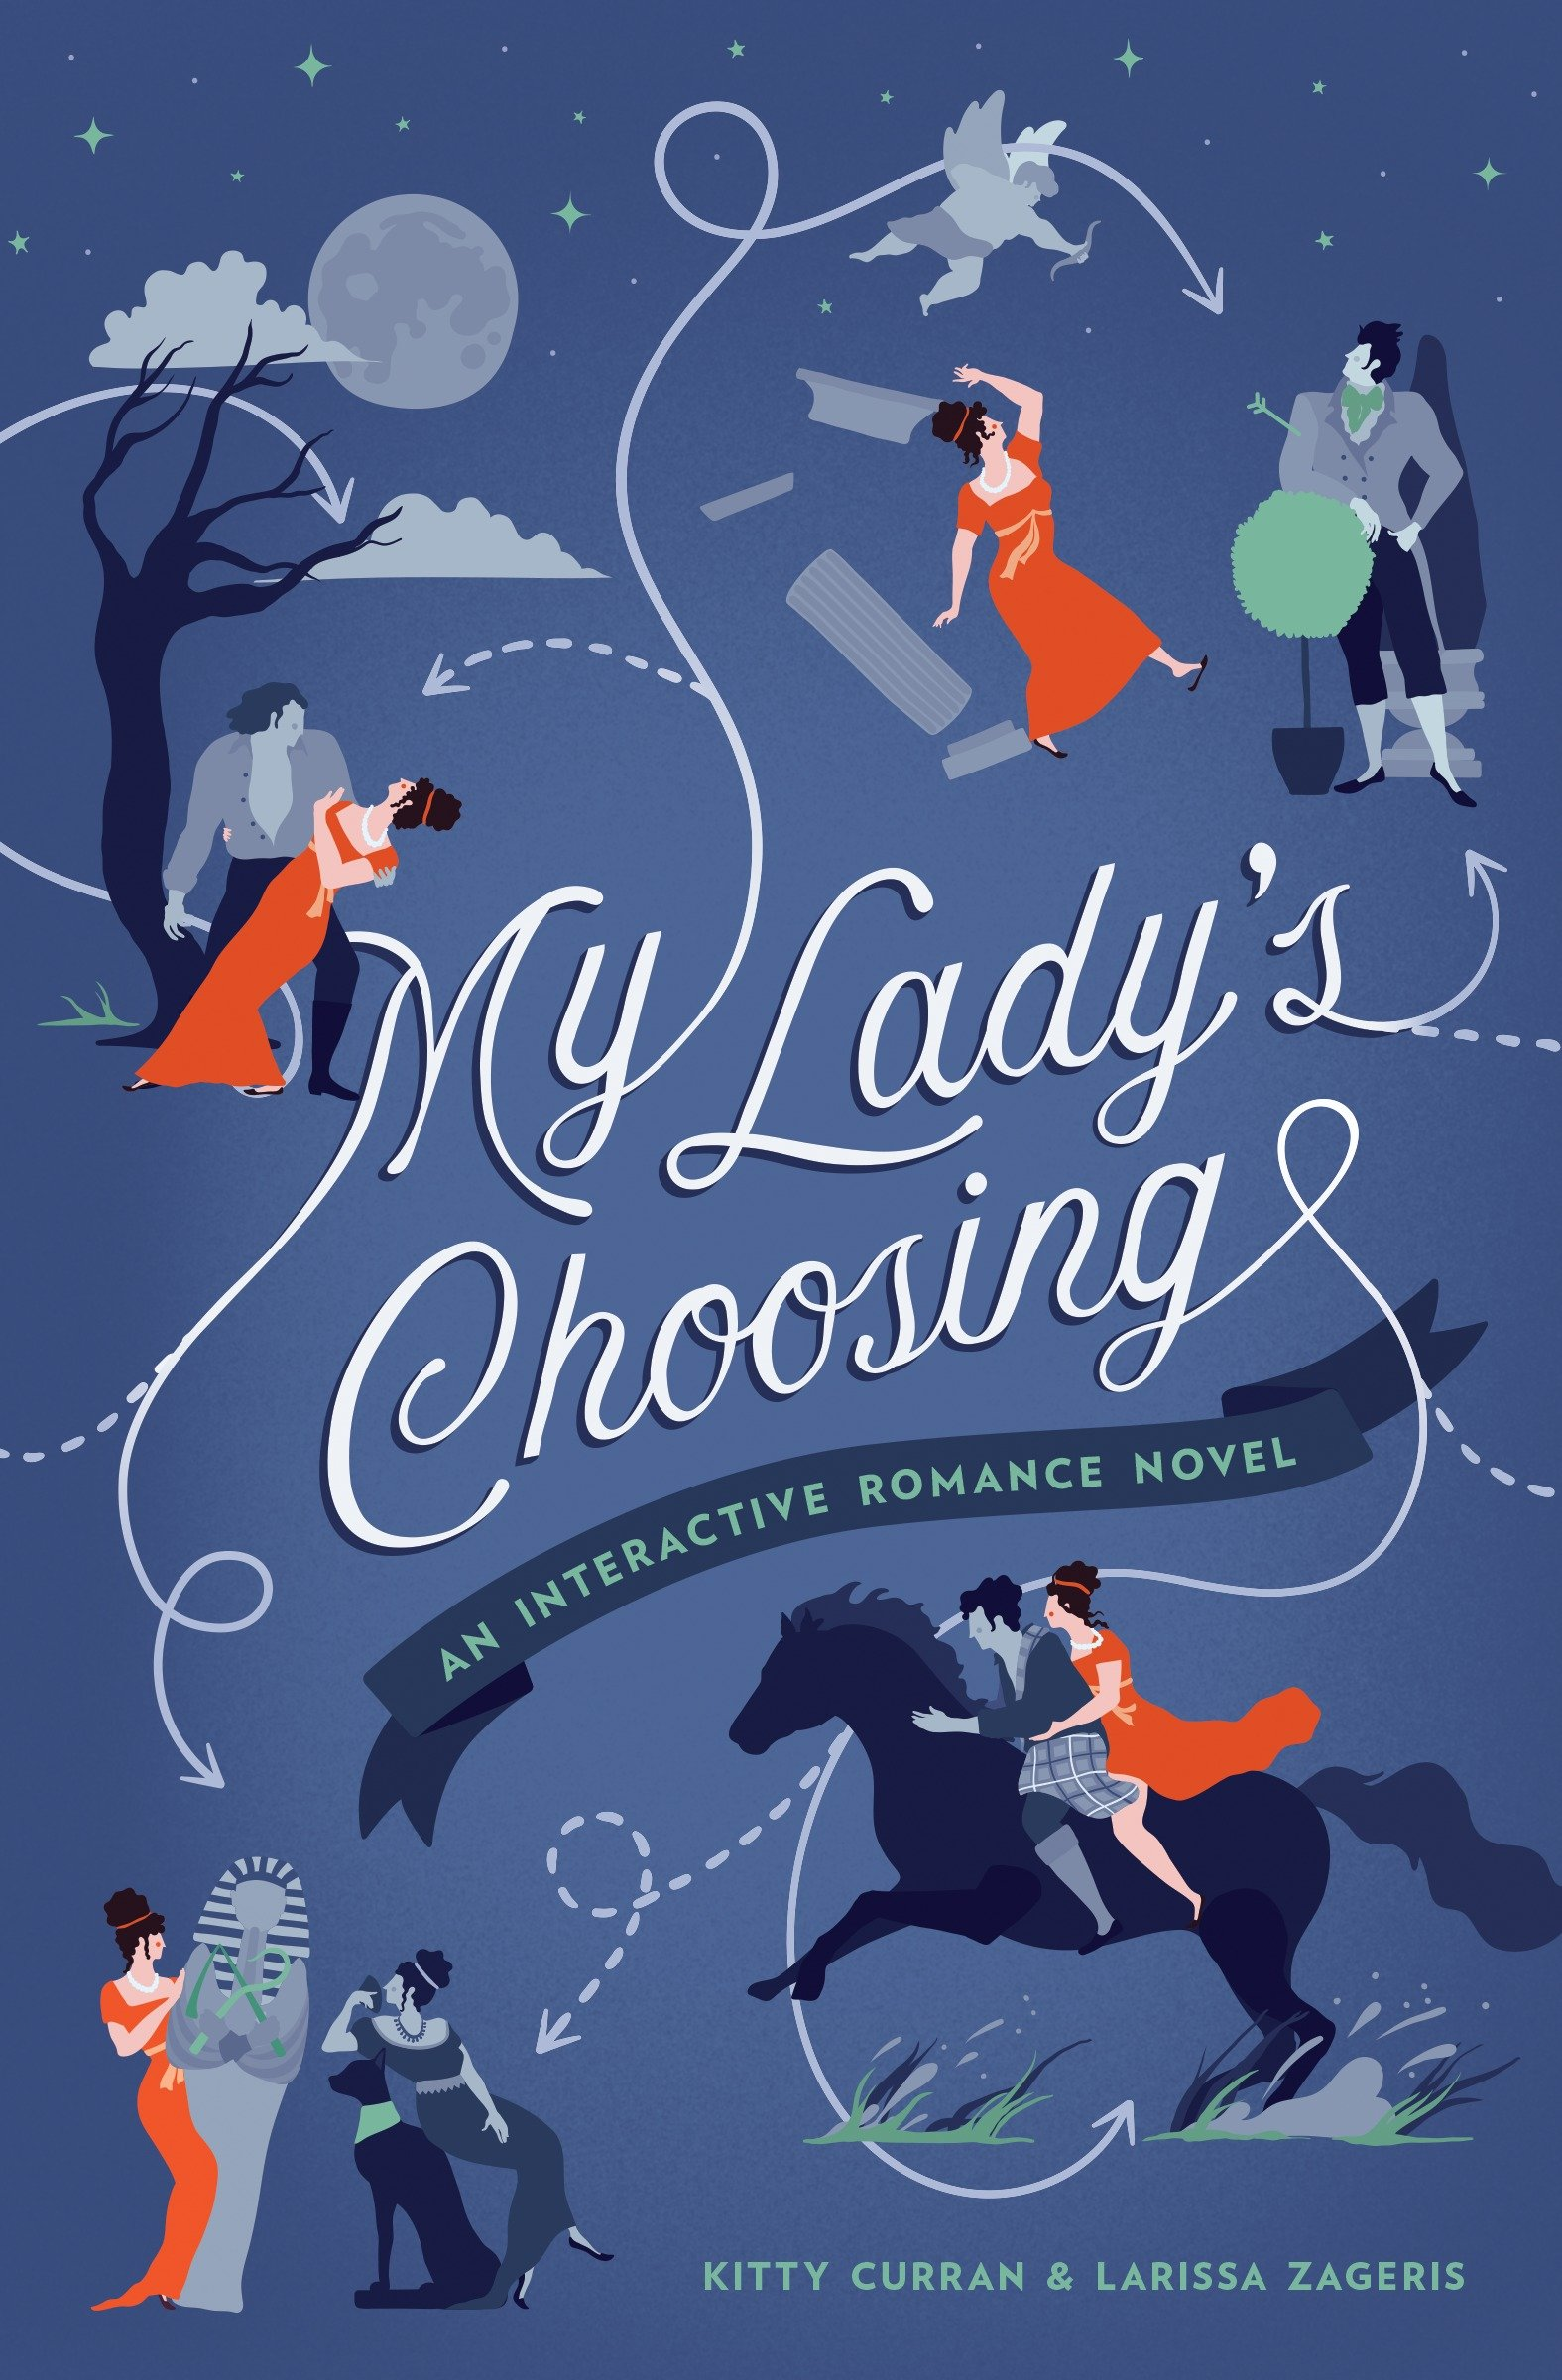 My Lady's Choosing An Interactive Romance Nove l